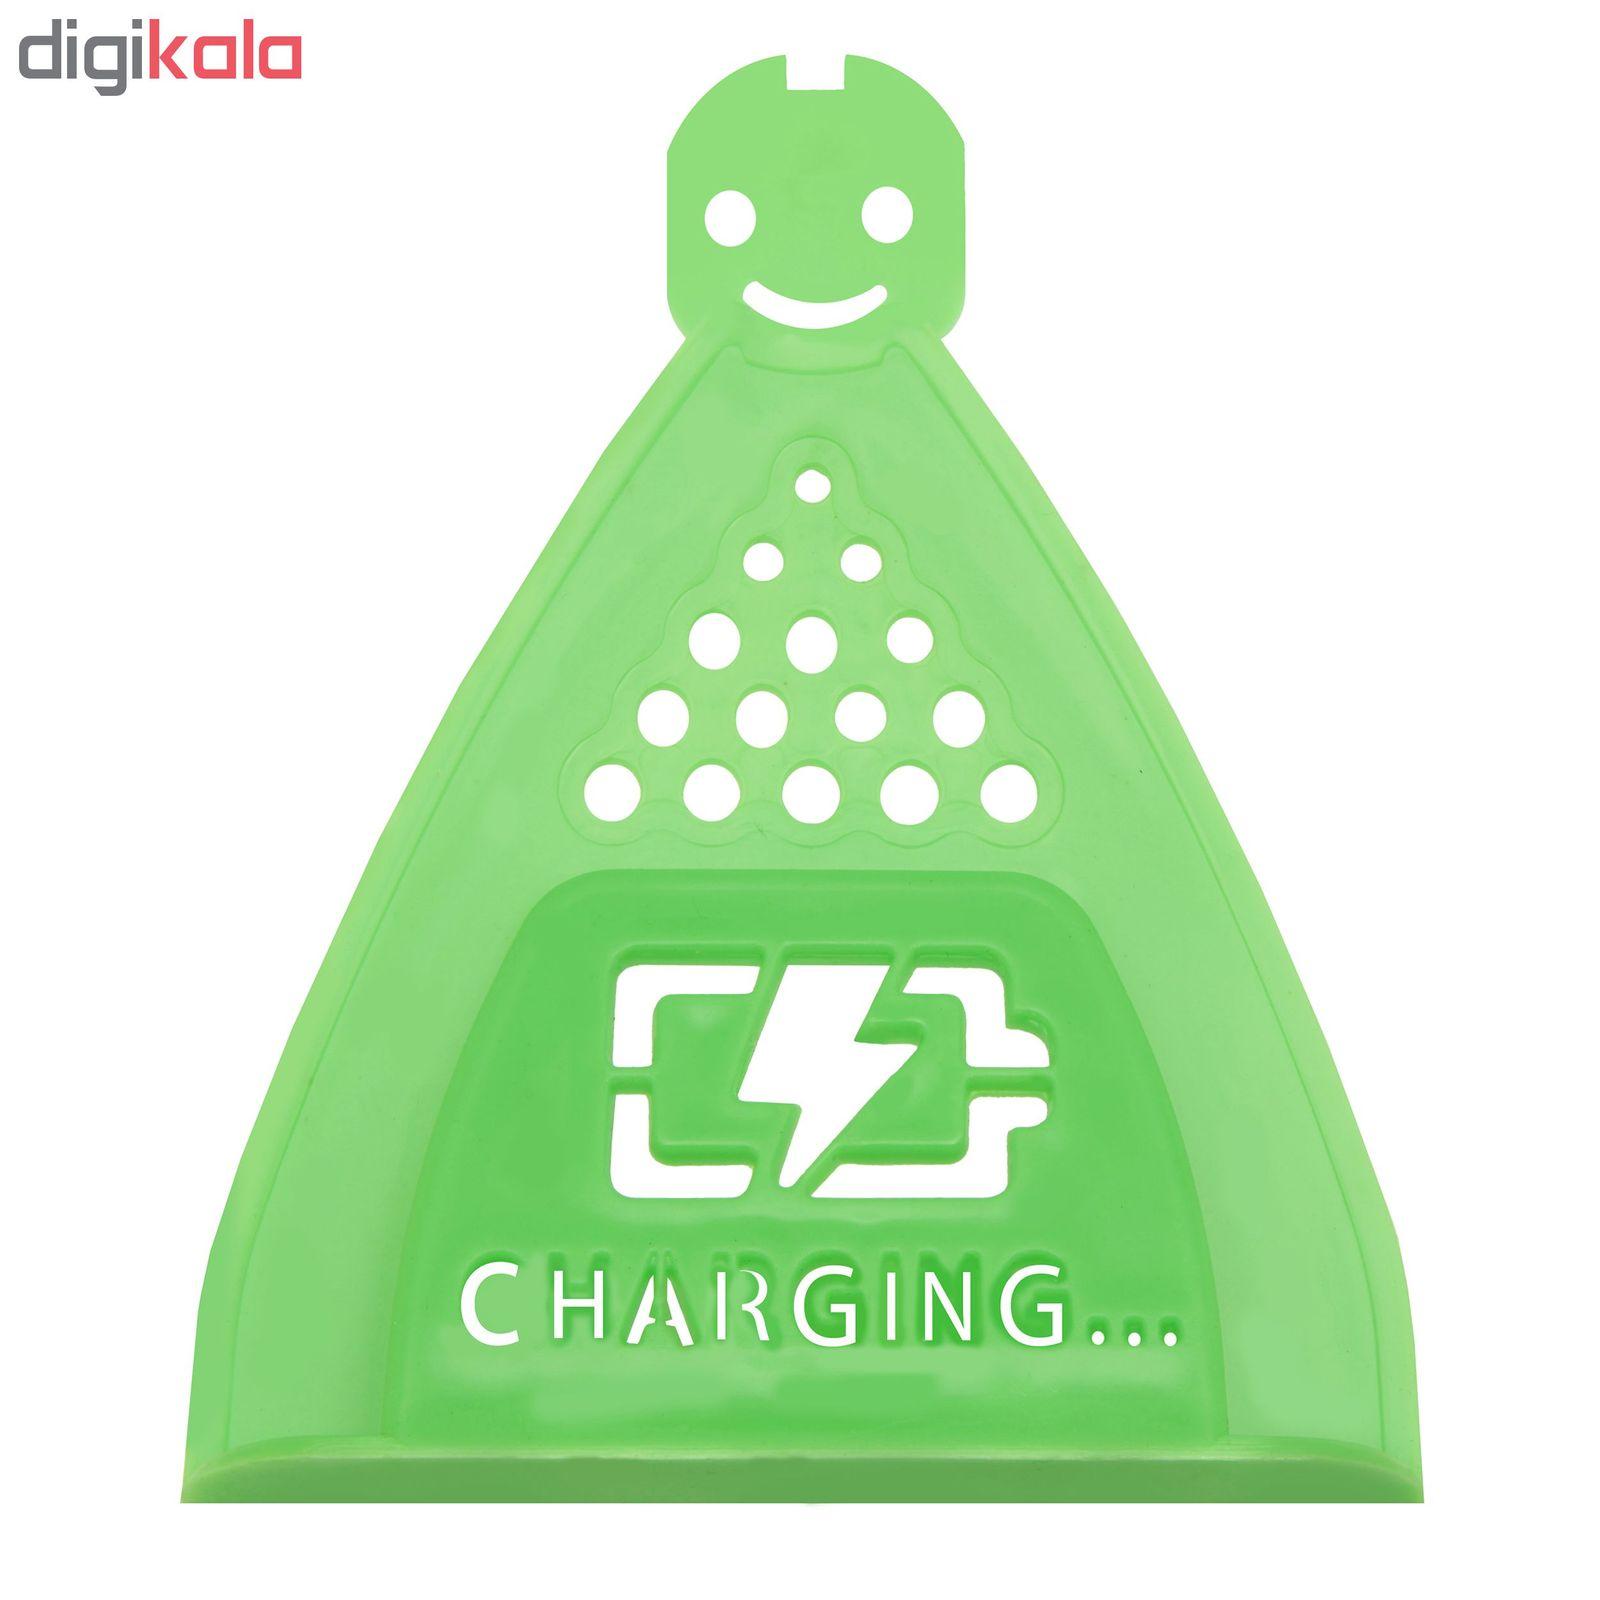 پایه نگهدارنده شارژر موبایل مدل Hng 0229 main 1 4